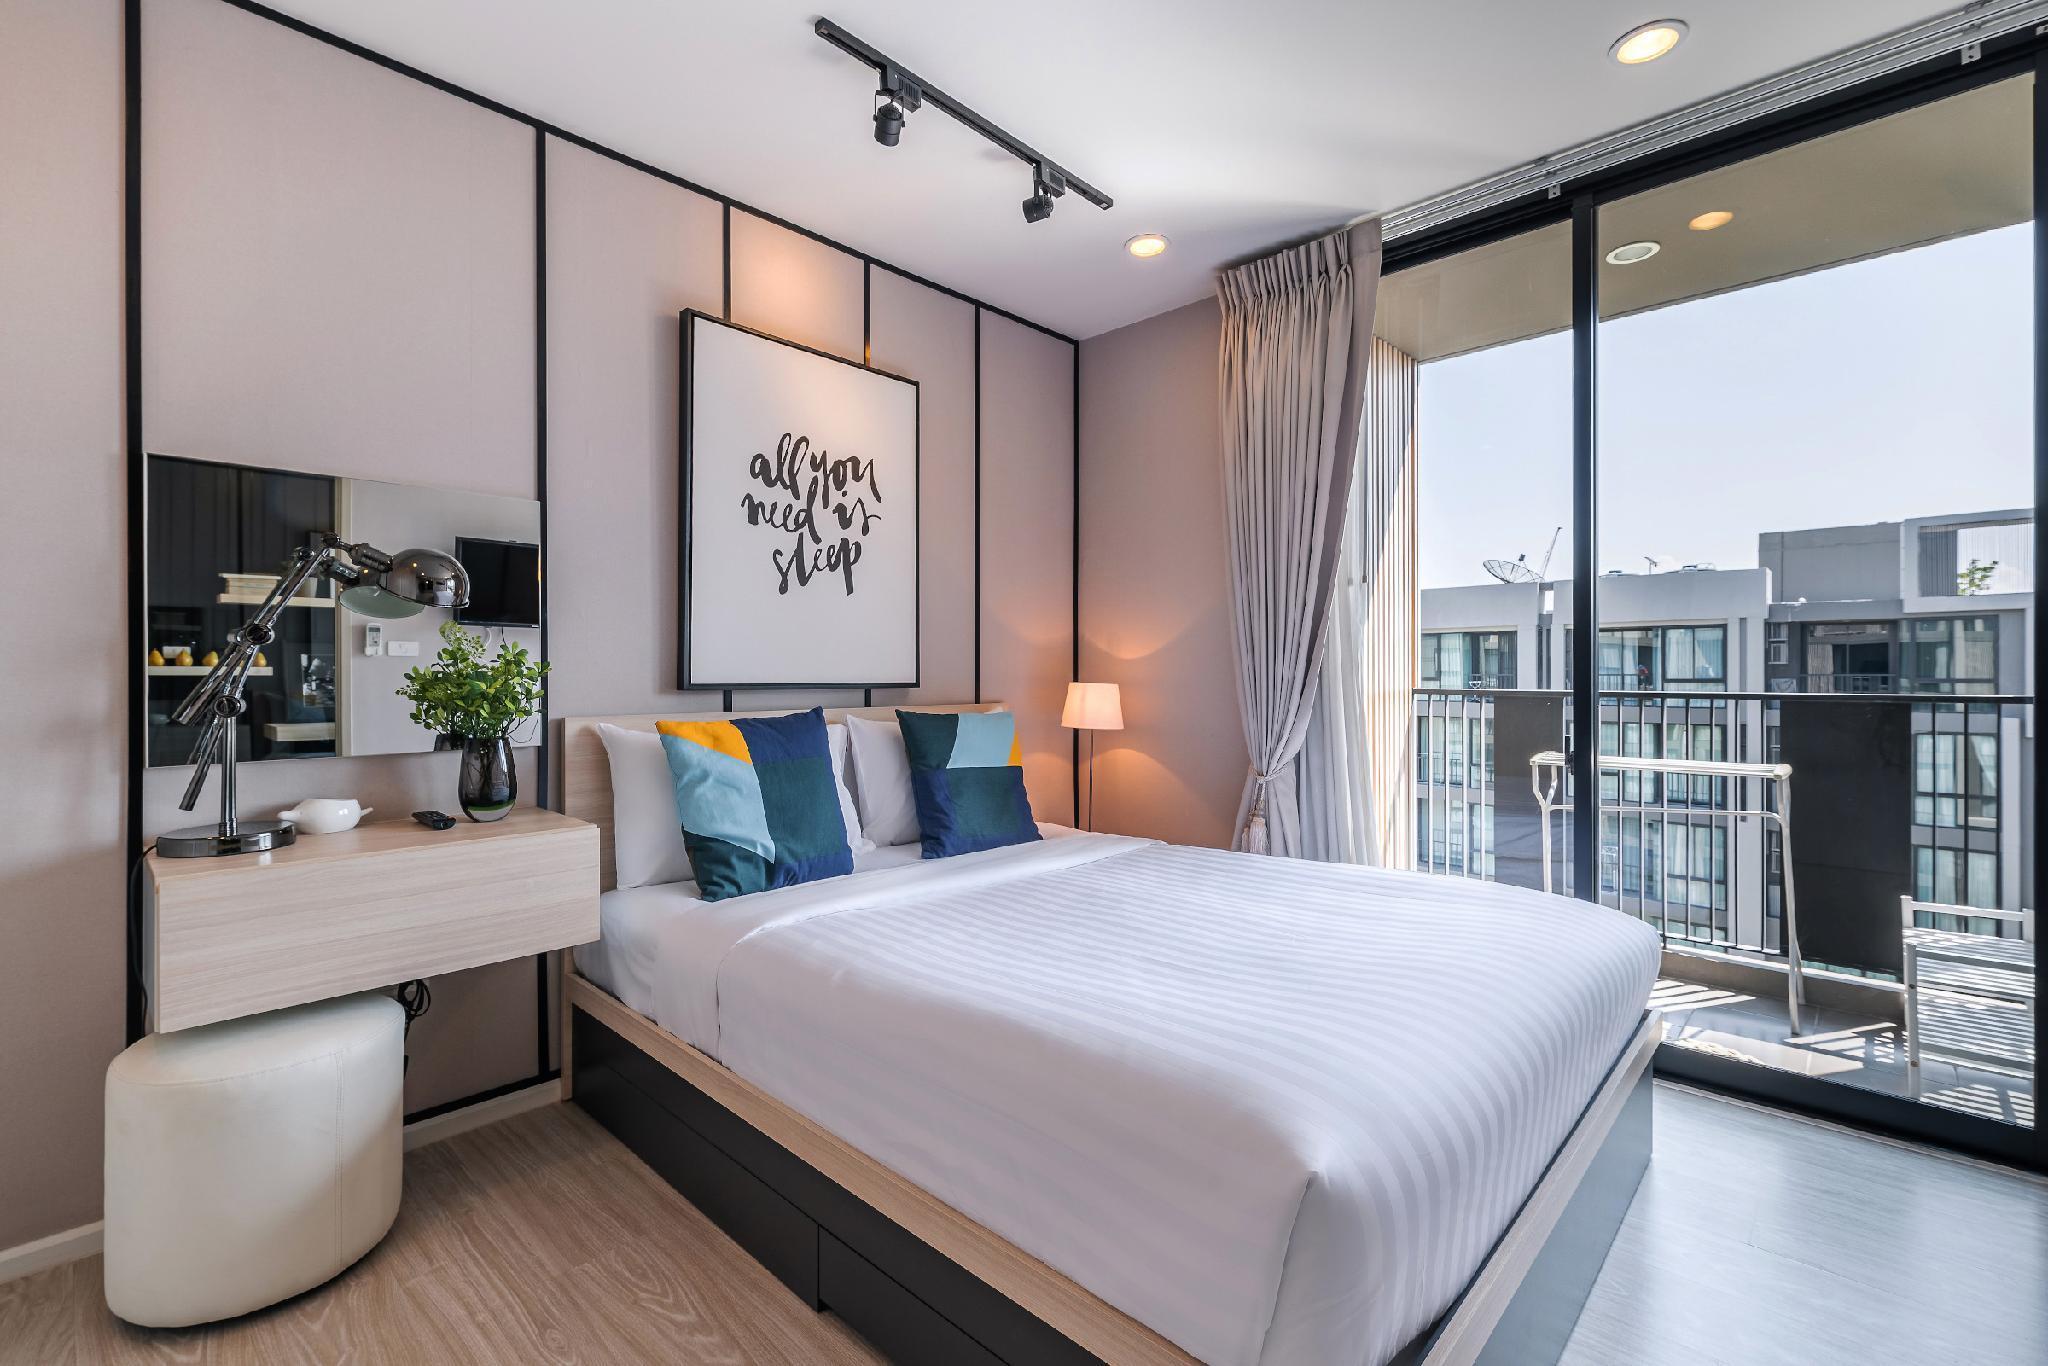 One Bedroom Suite in Nimman by Belcarra Spaces F89 อพาร์ตเมนต์ 1 ห้องนอน 1 ห้องน้ำส่วนตัว ขนาด 32 ตร.ม. – นิมมานเหมินทร์